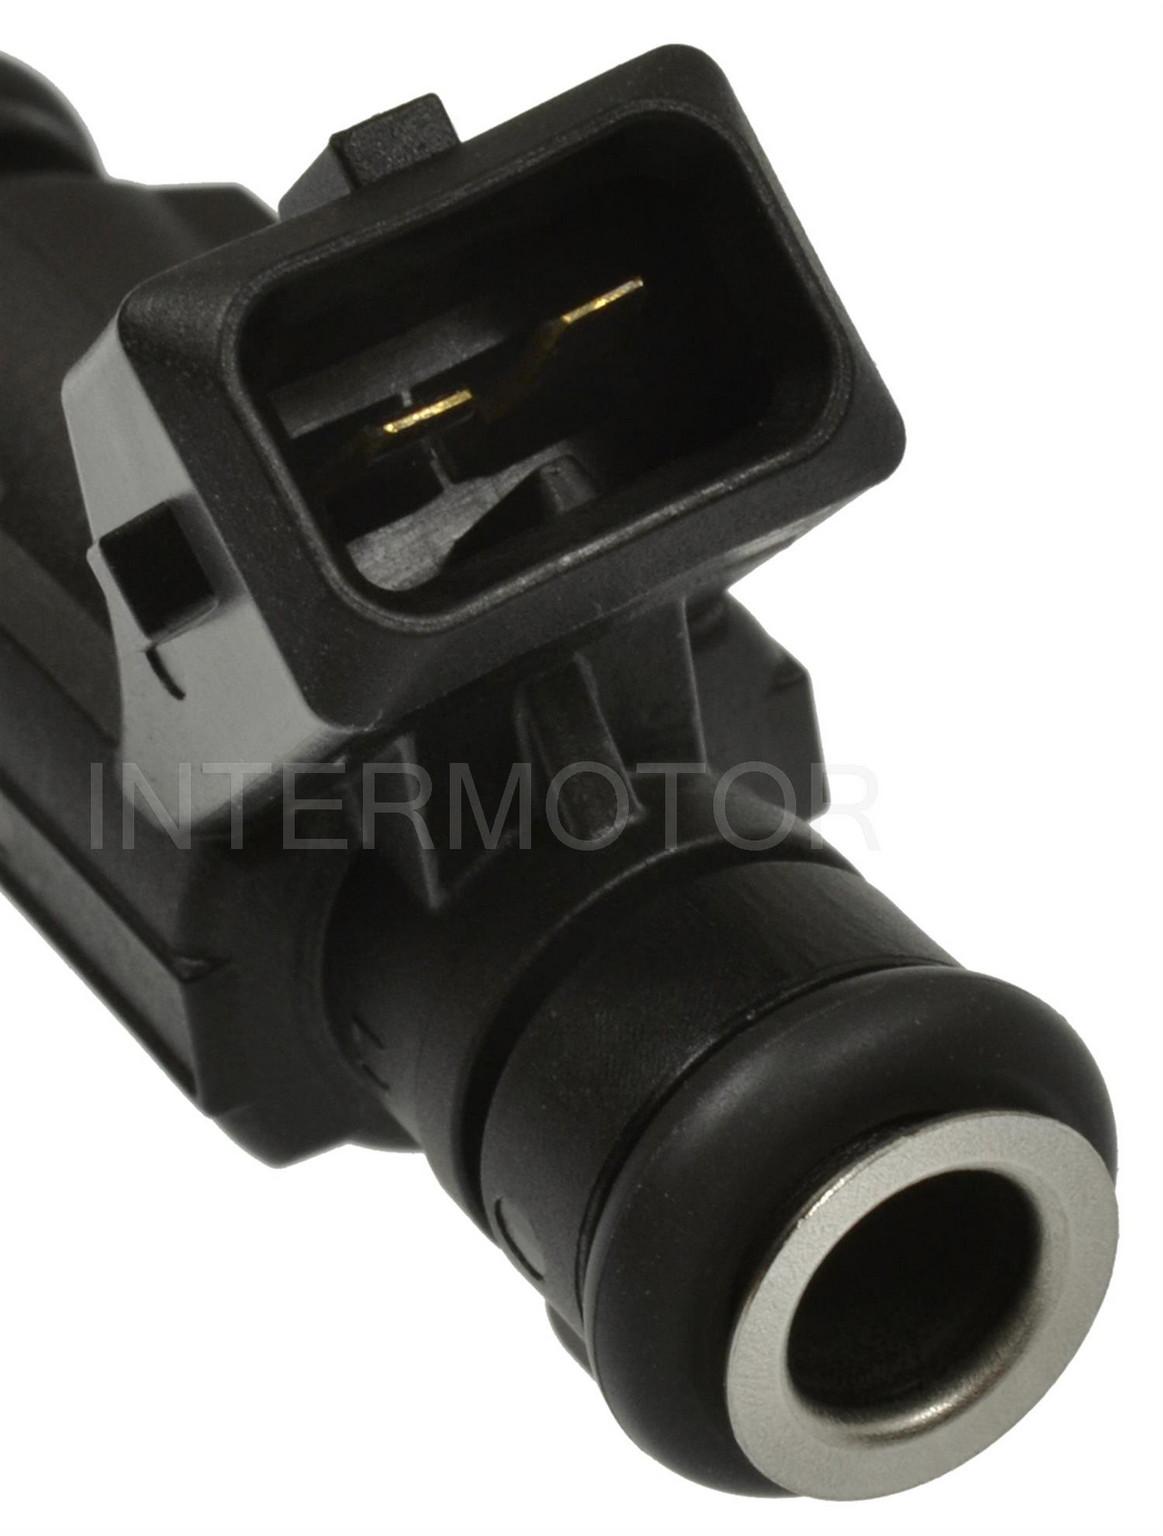 2000 Mercedes Benz Ml320 Fuel Injector Filter Replacement Si Fj665